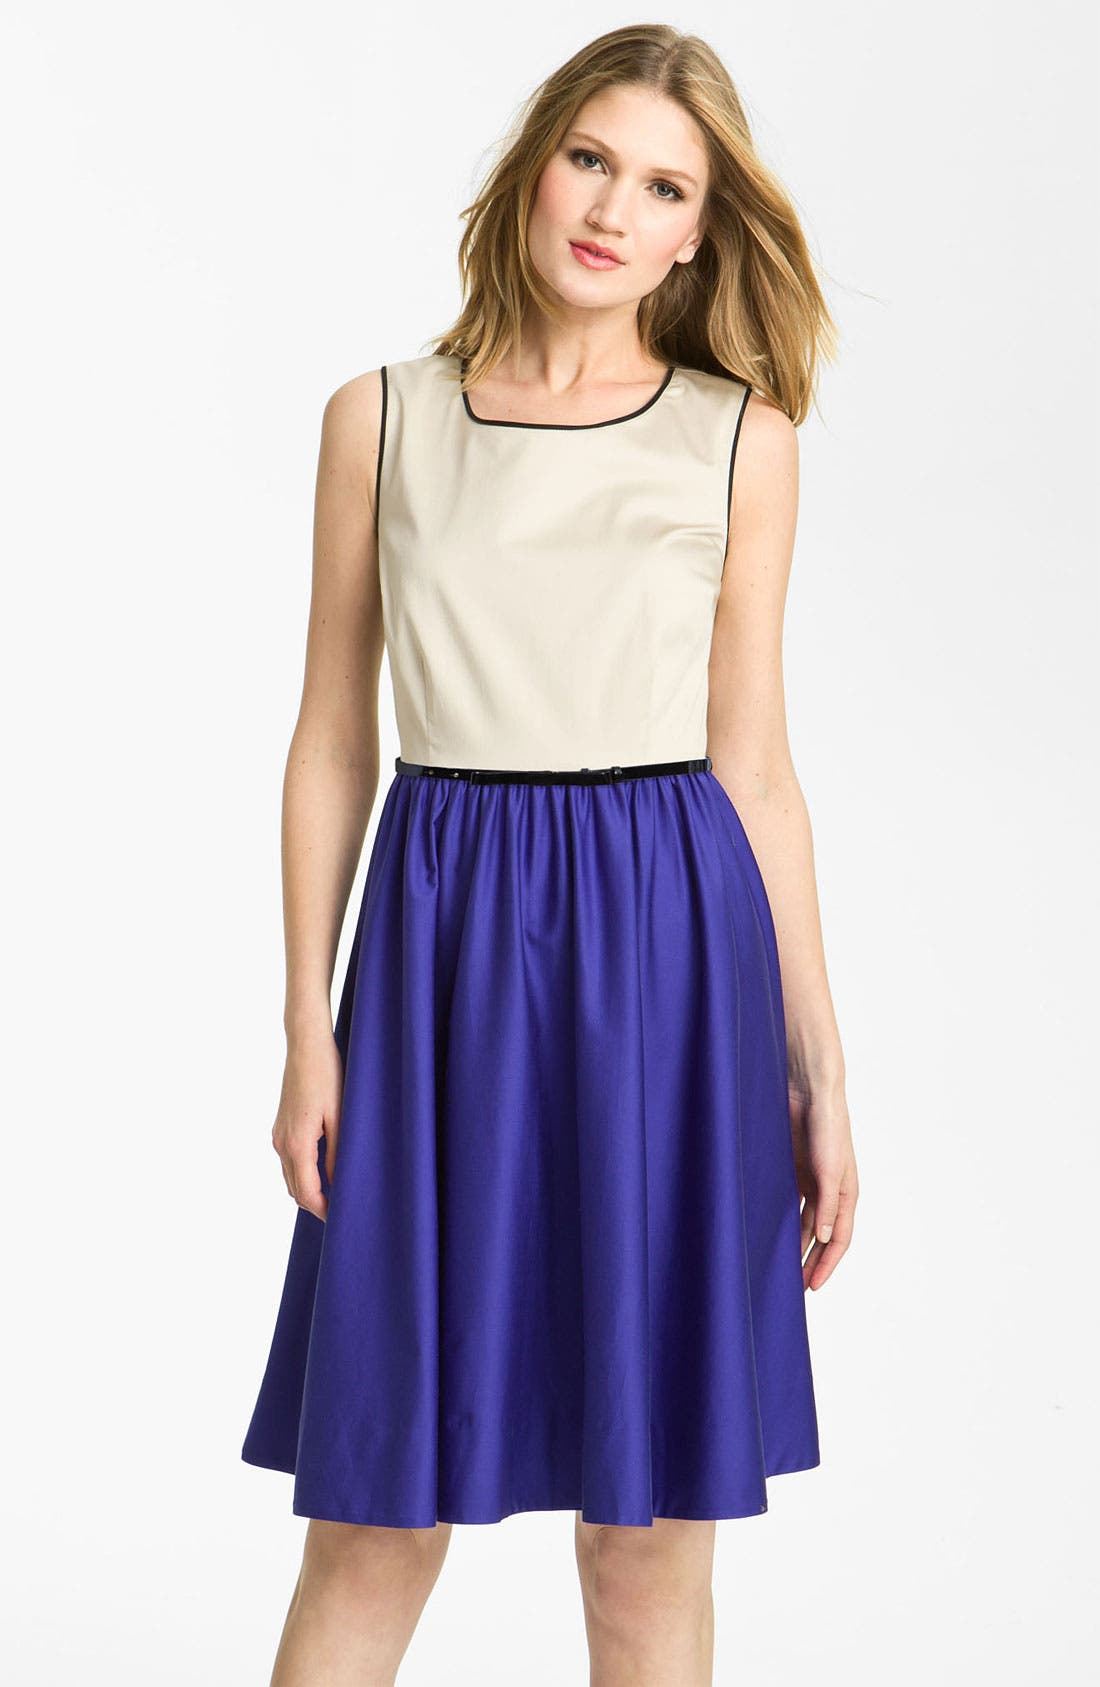 Main Image - kate spade new york 'dee' colorblock dress